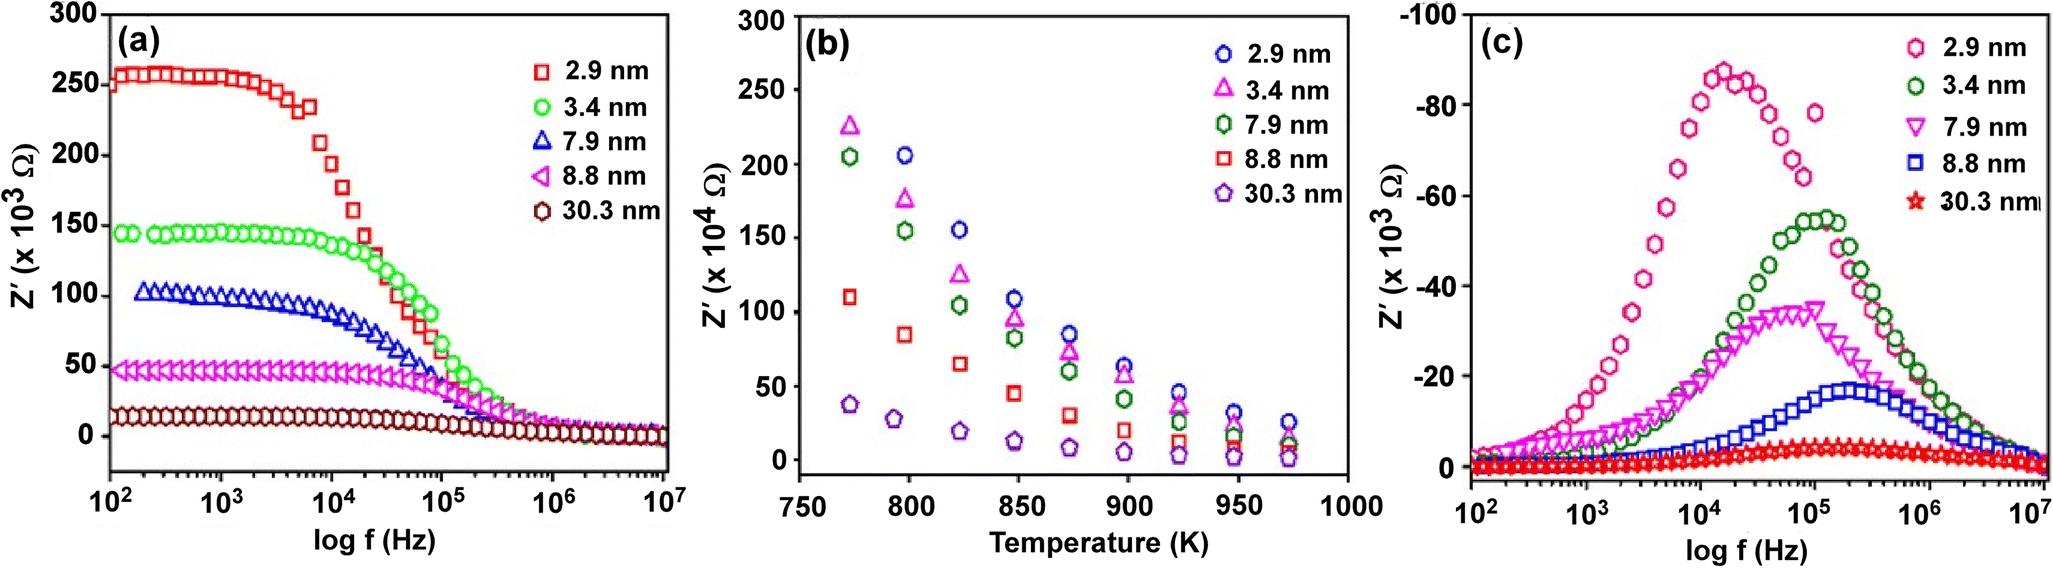 Tuning electrical properties of nanocrystalline Y2Zr2O7